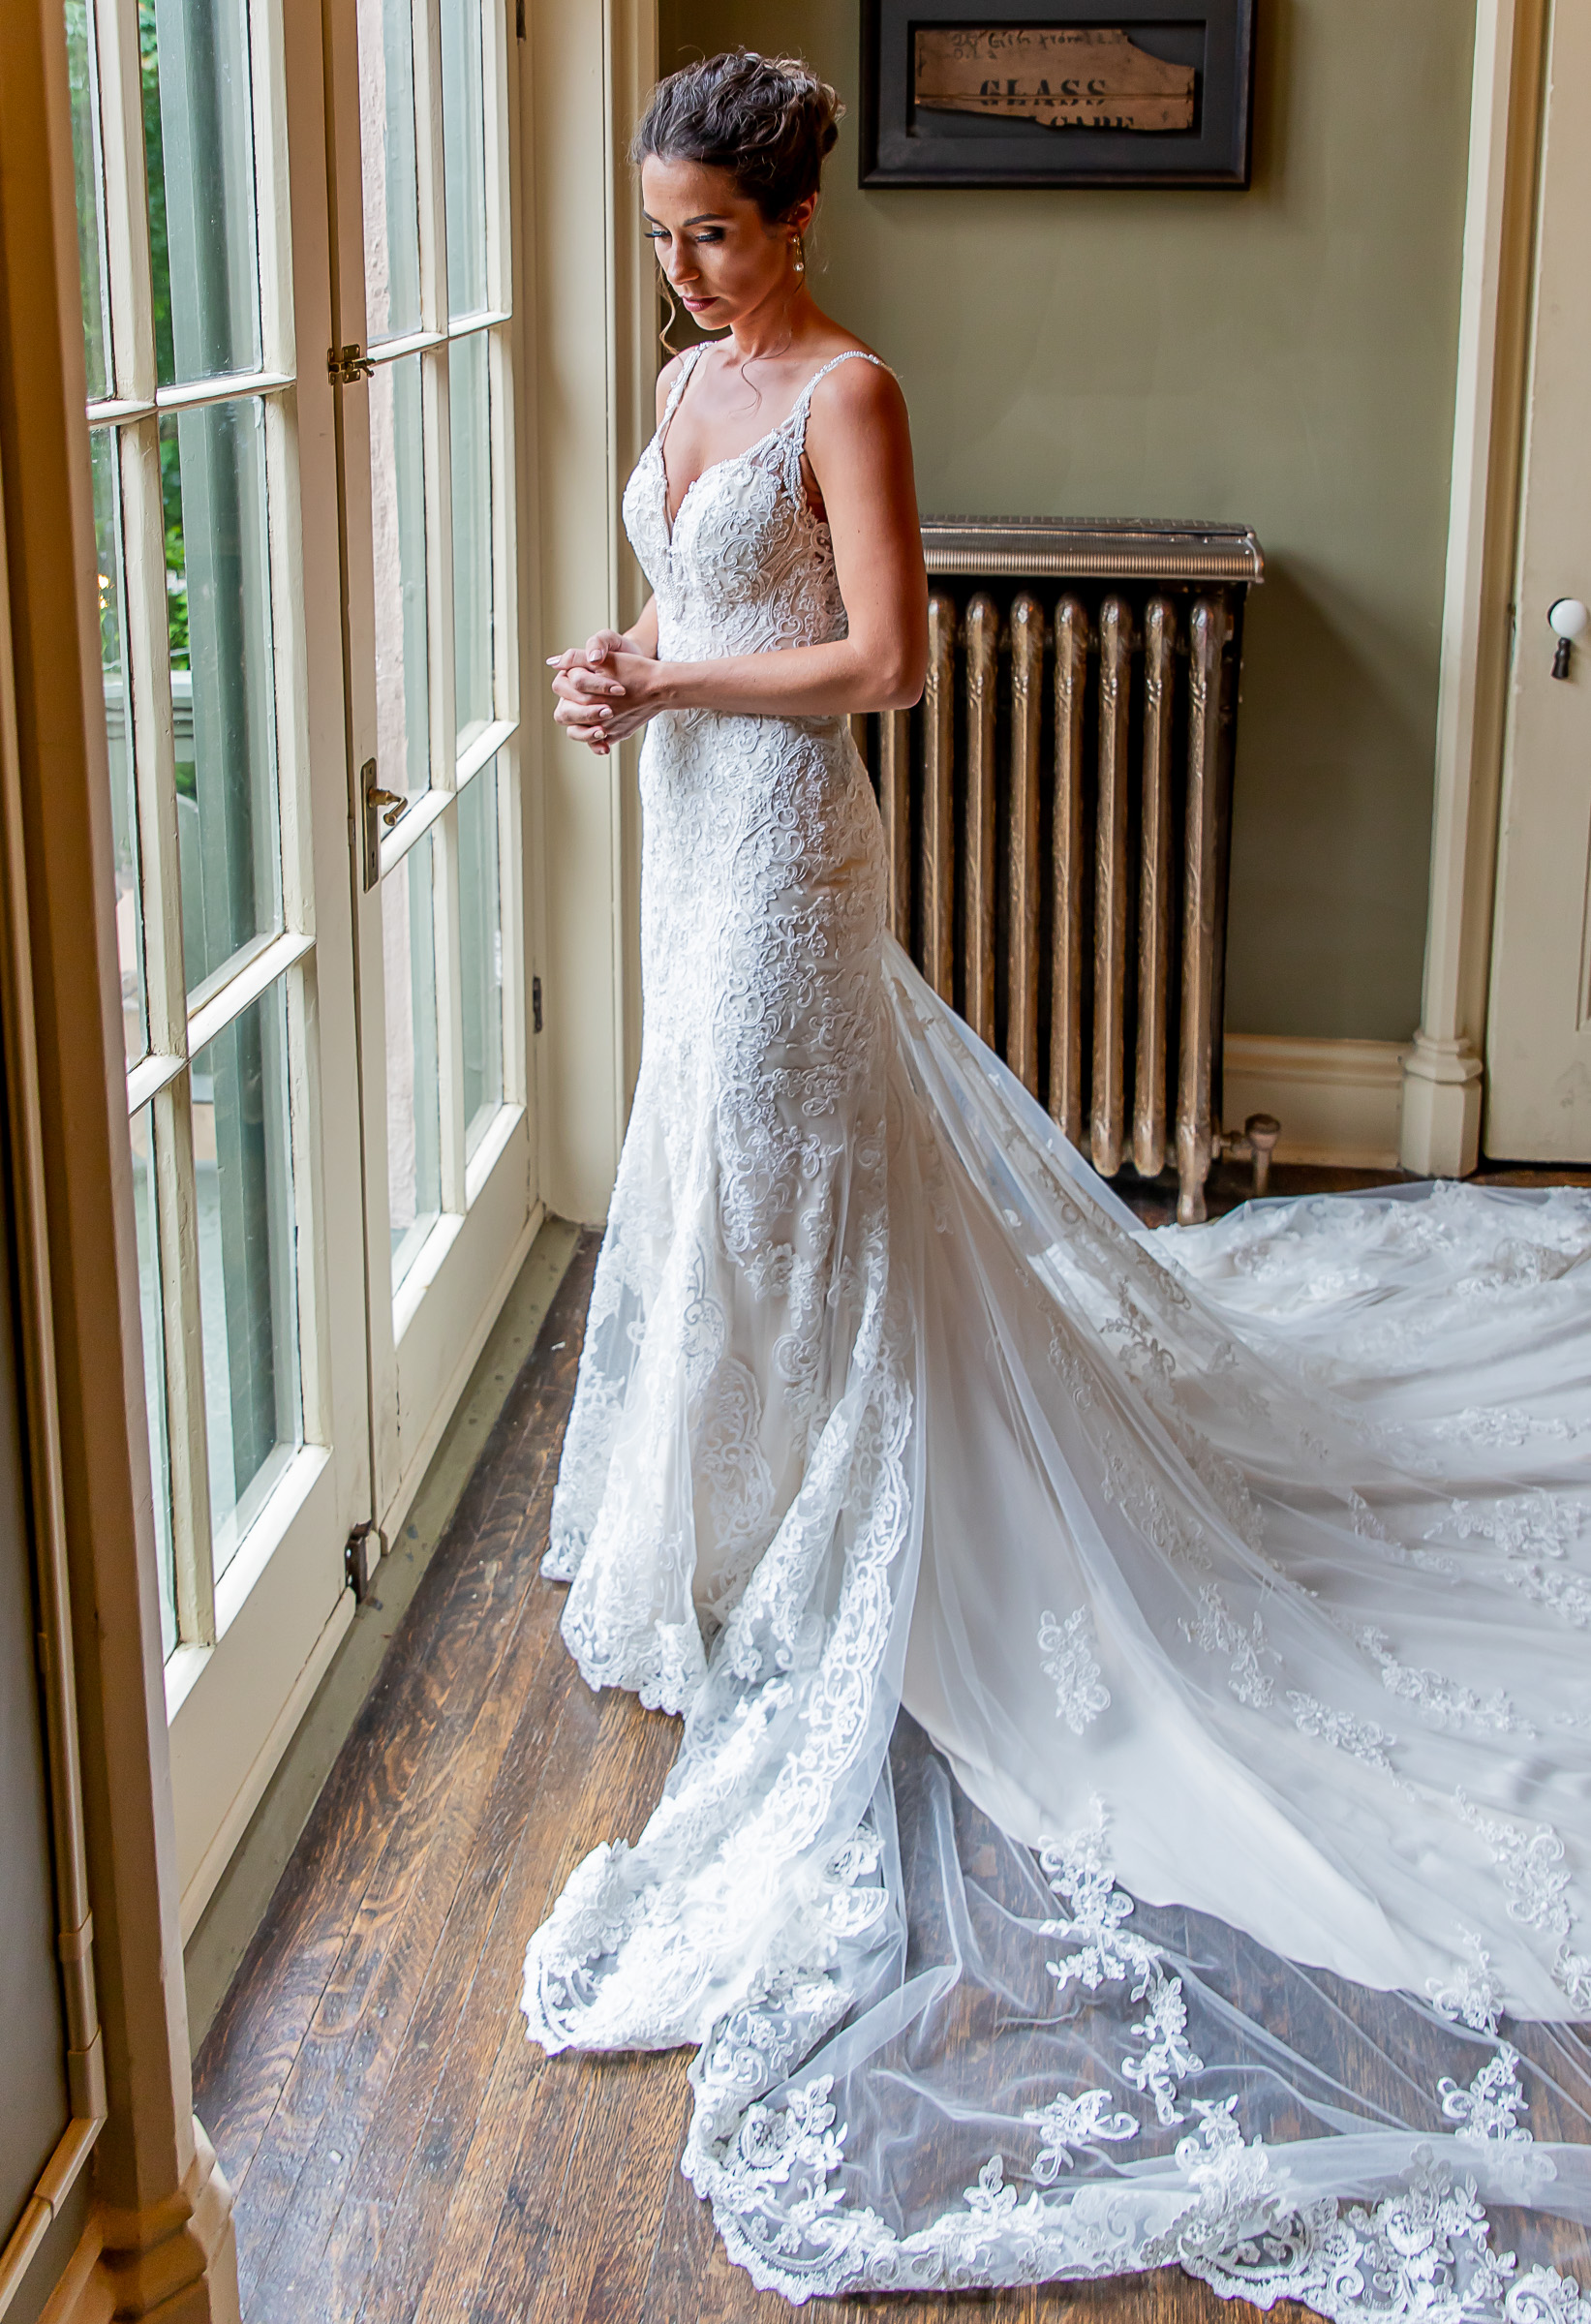 fowler house blog erin wedding-57.jpg